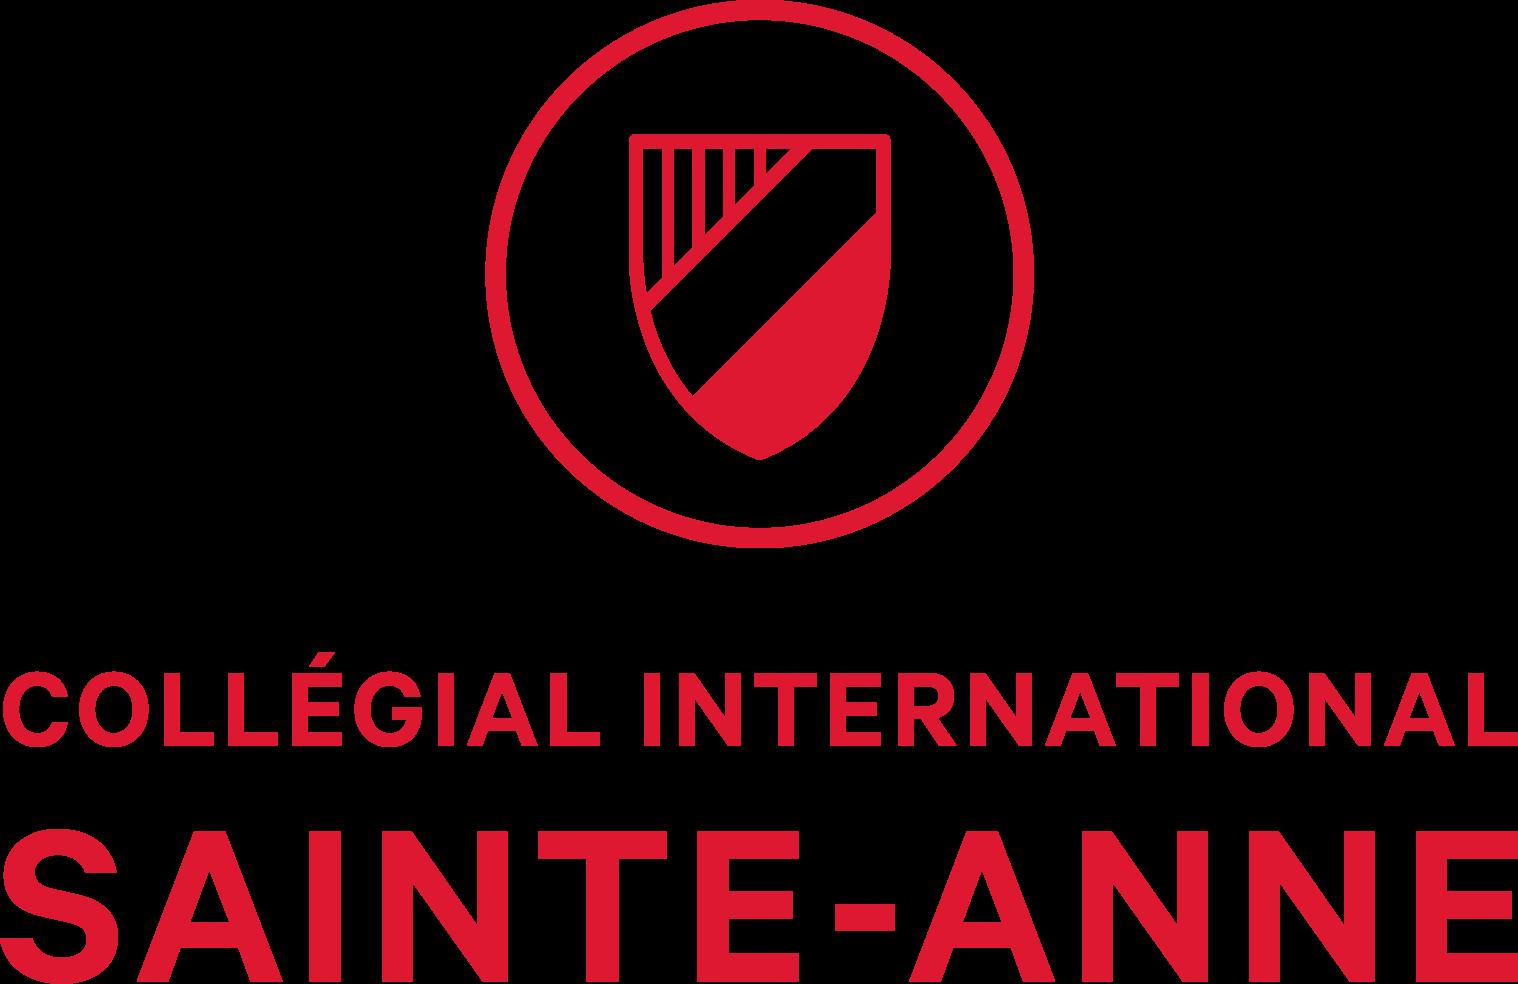 Collégial international Sainte-Anne